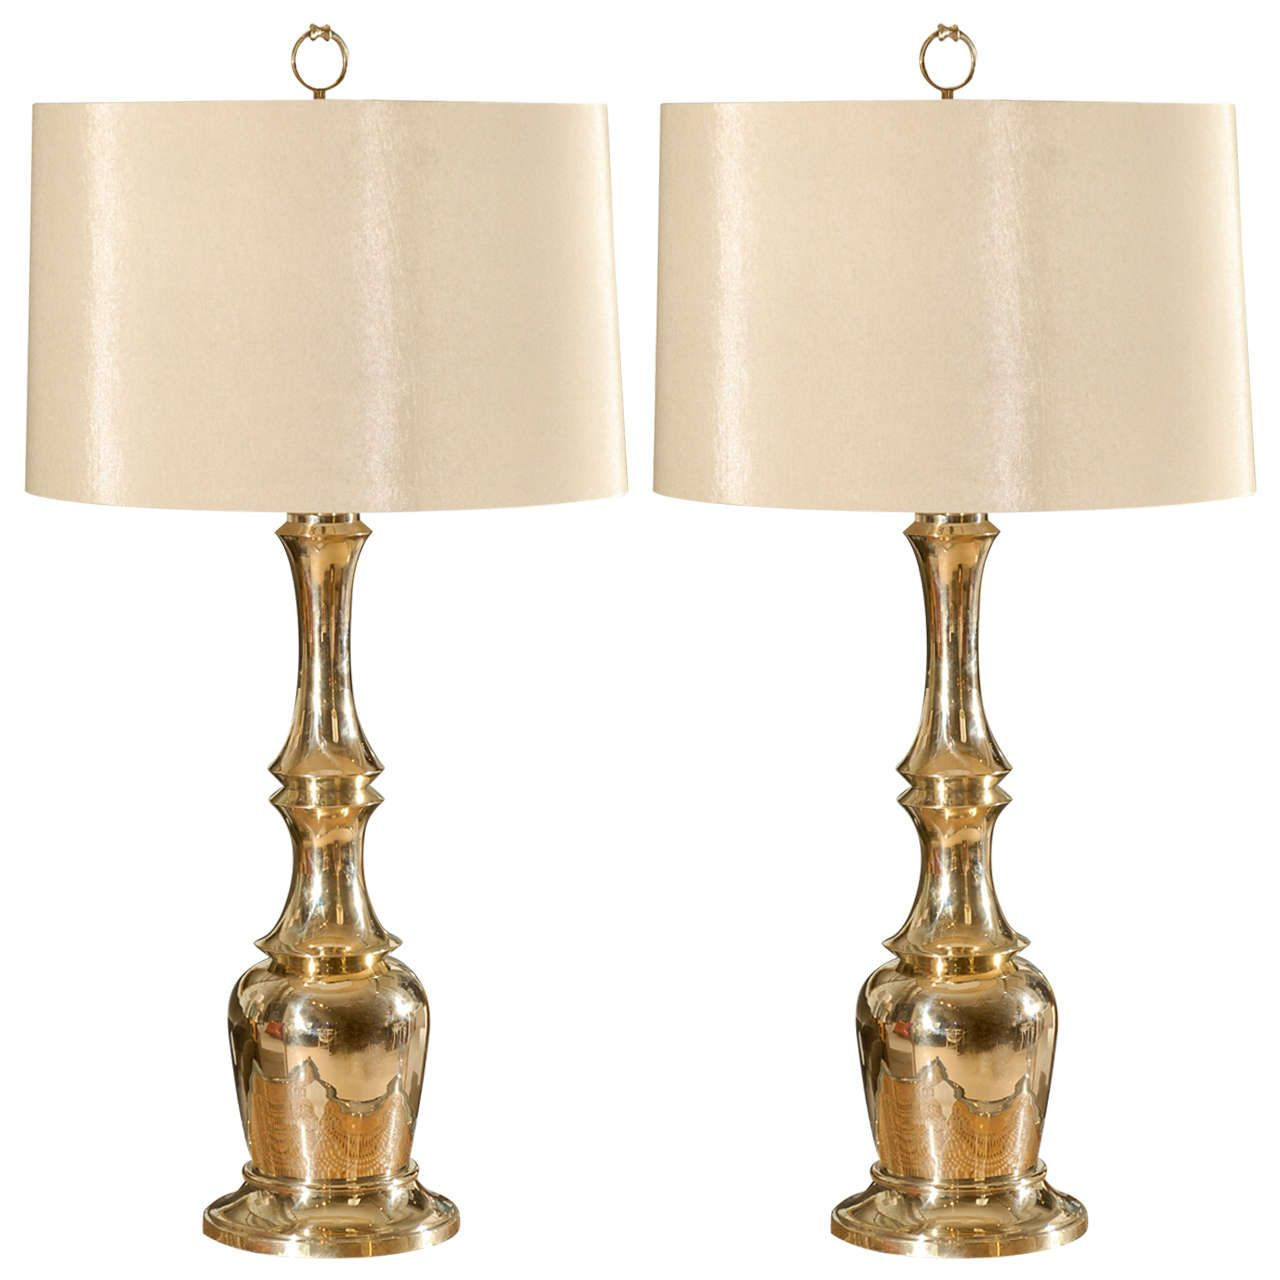 Pair of Brass Faux Bamboo Lamps by Warren Kessler